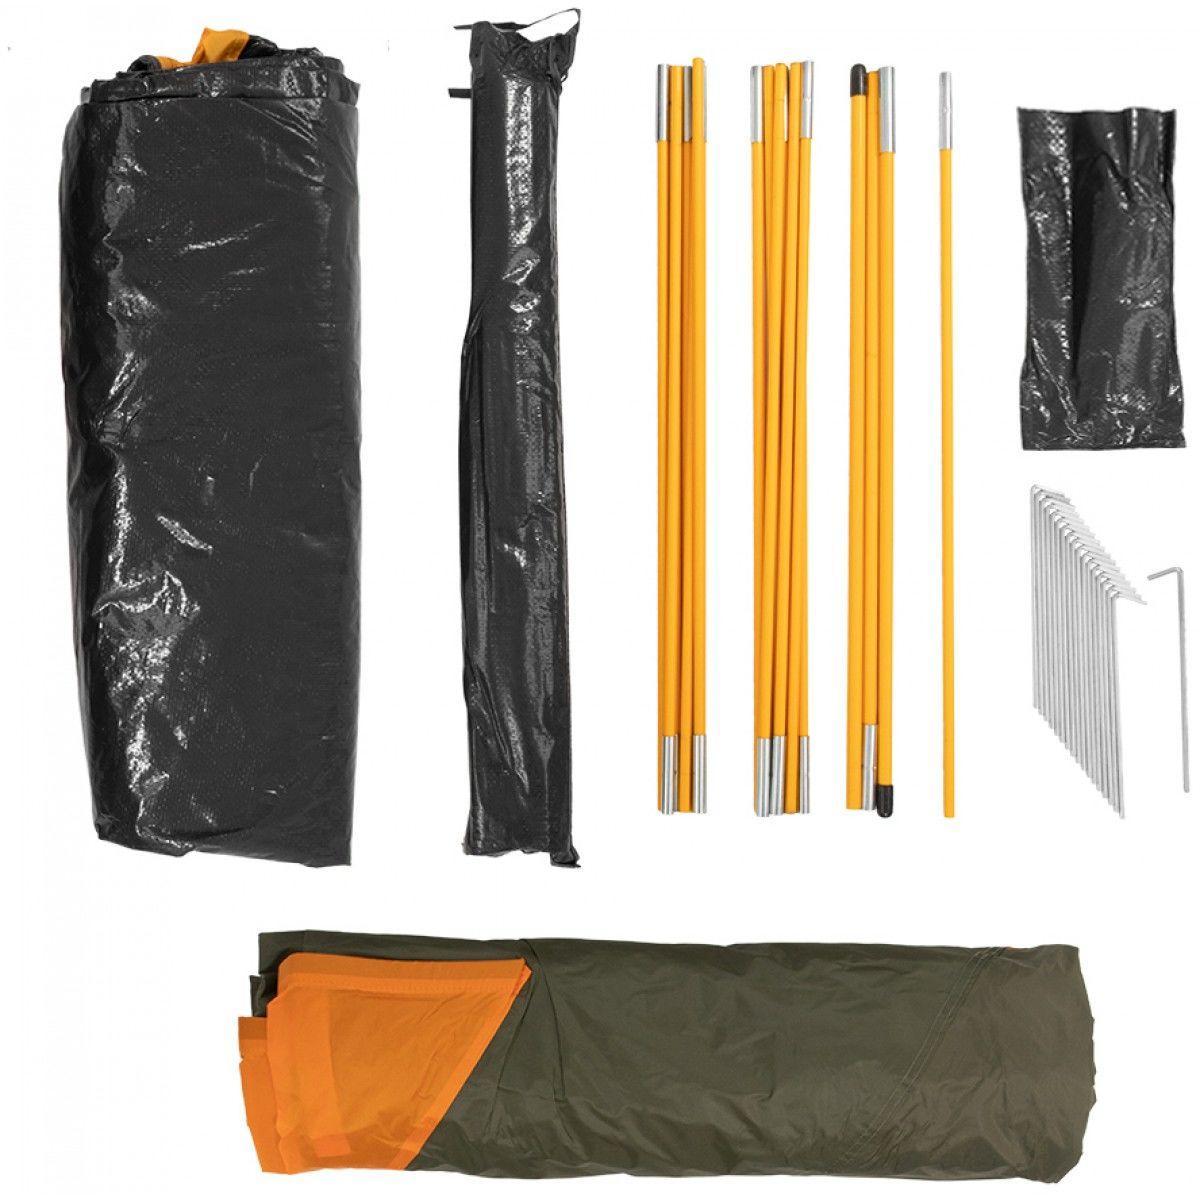 Палатка MUSSON-4 Helios зеленый-оранжевый HS-2366-4 GO - фото 7